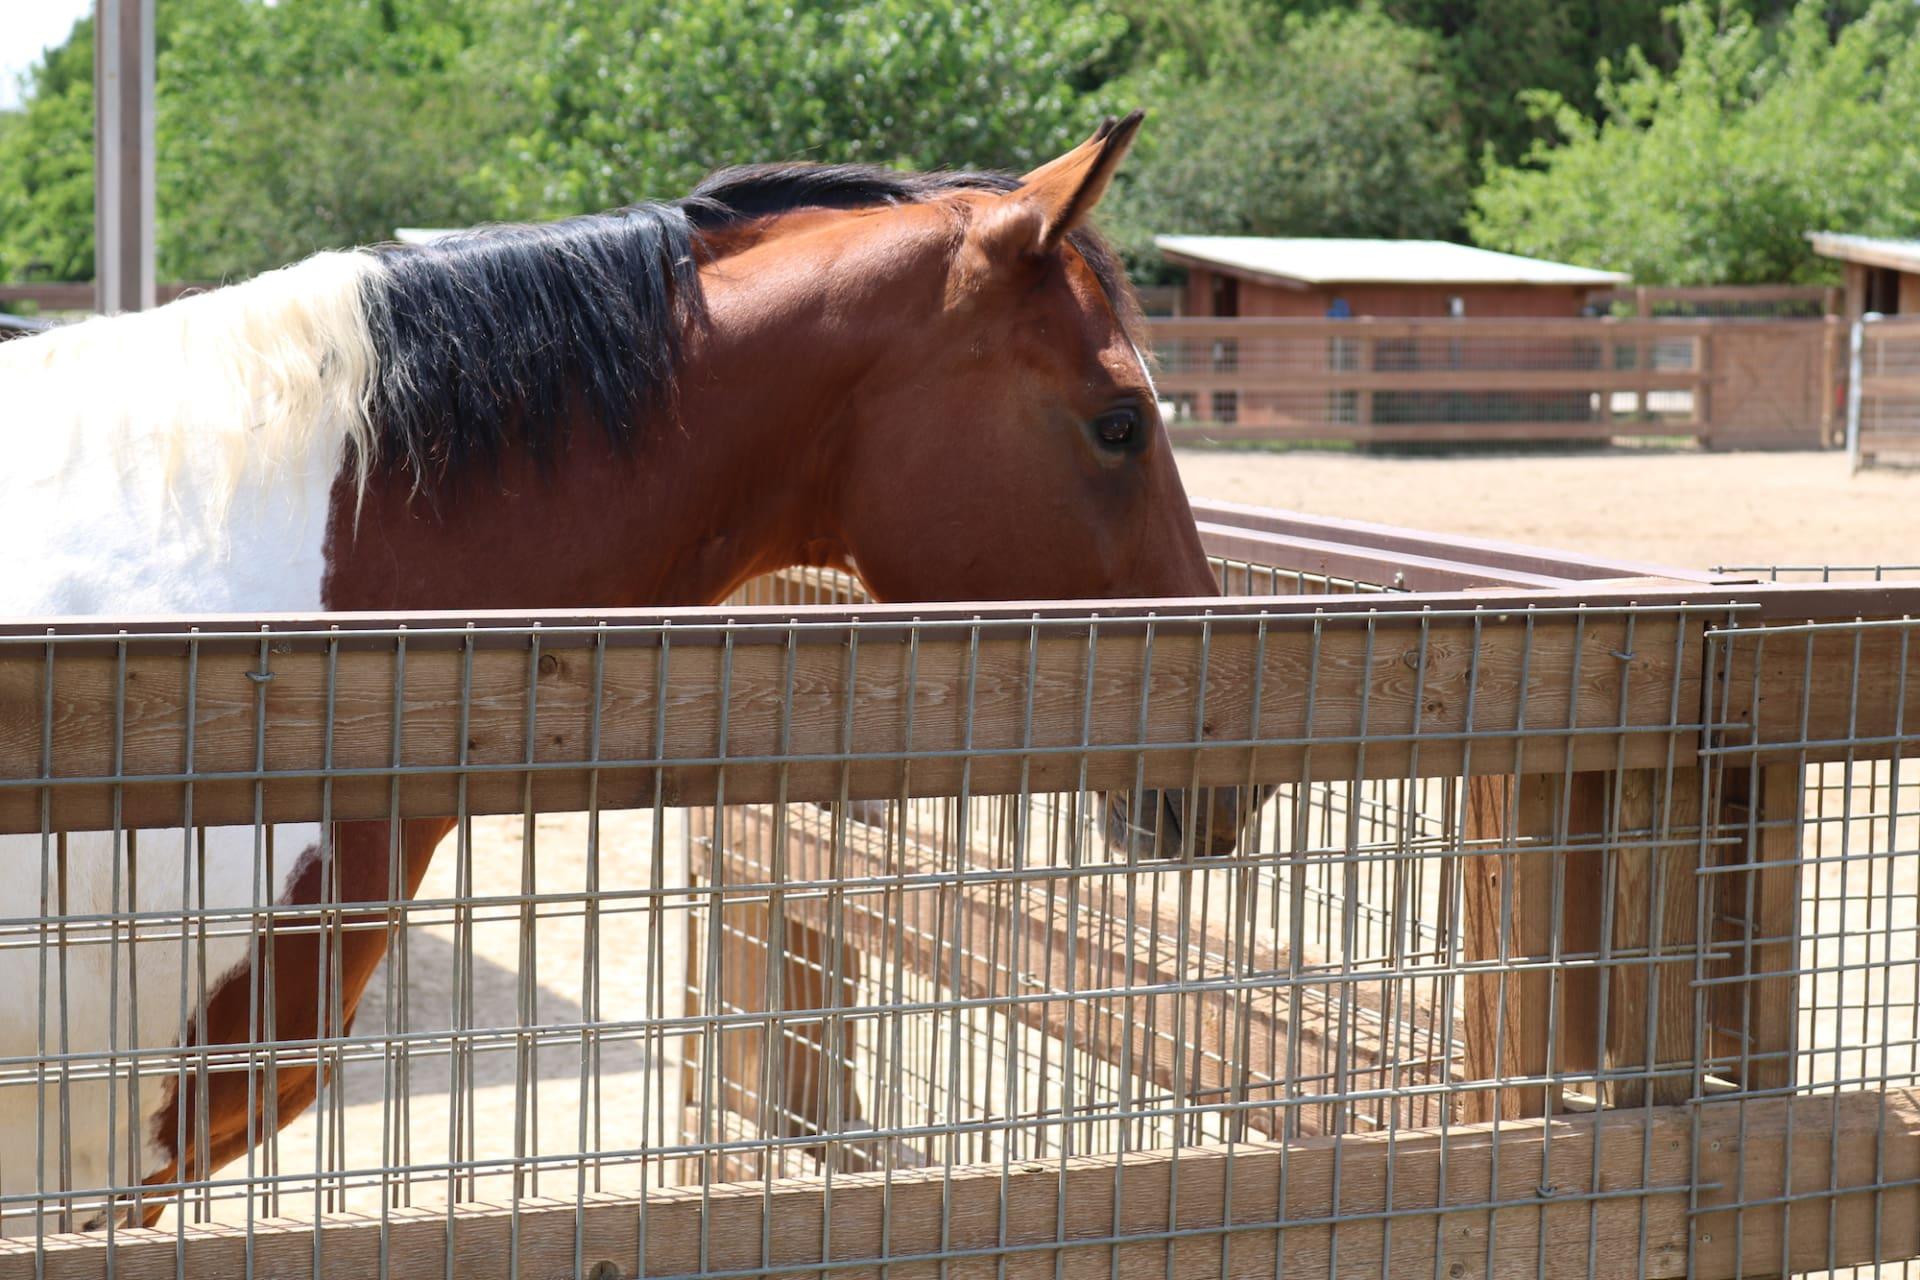 Denton County Giving: Ranch Hands Rescue